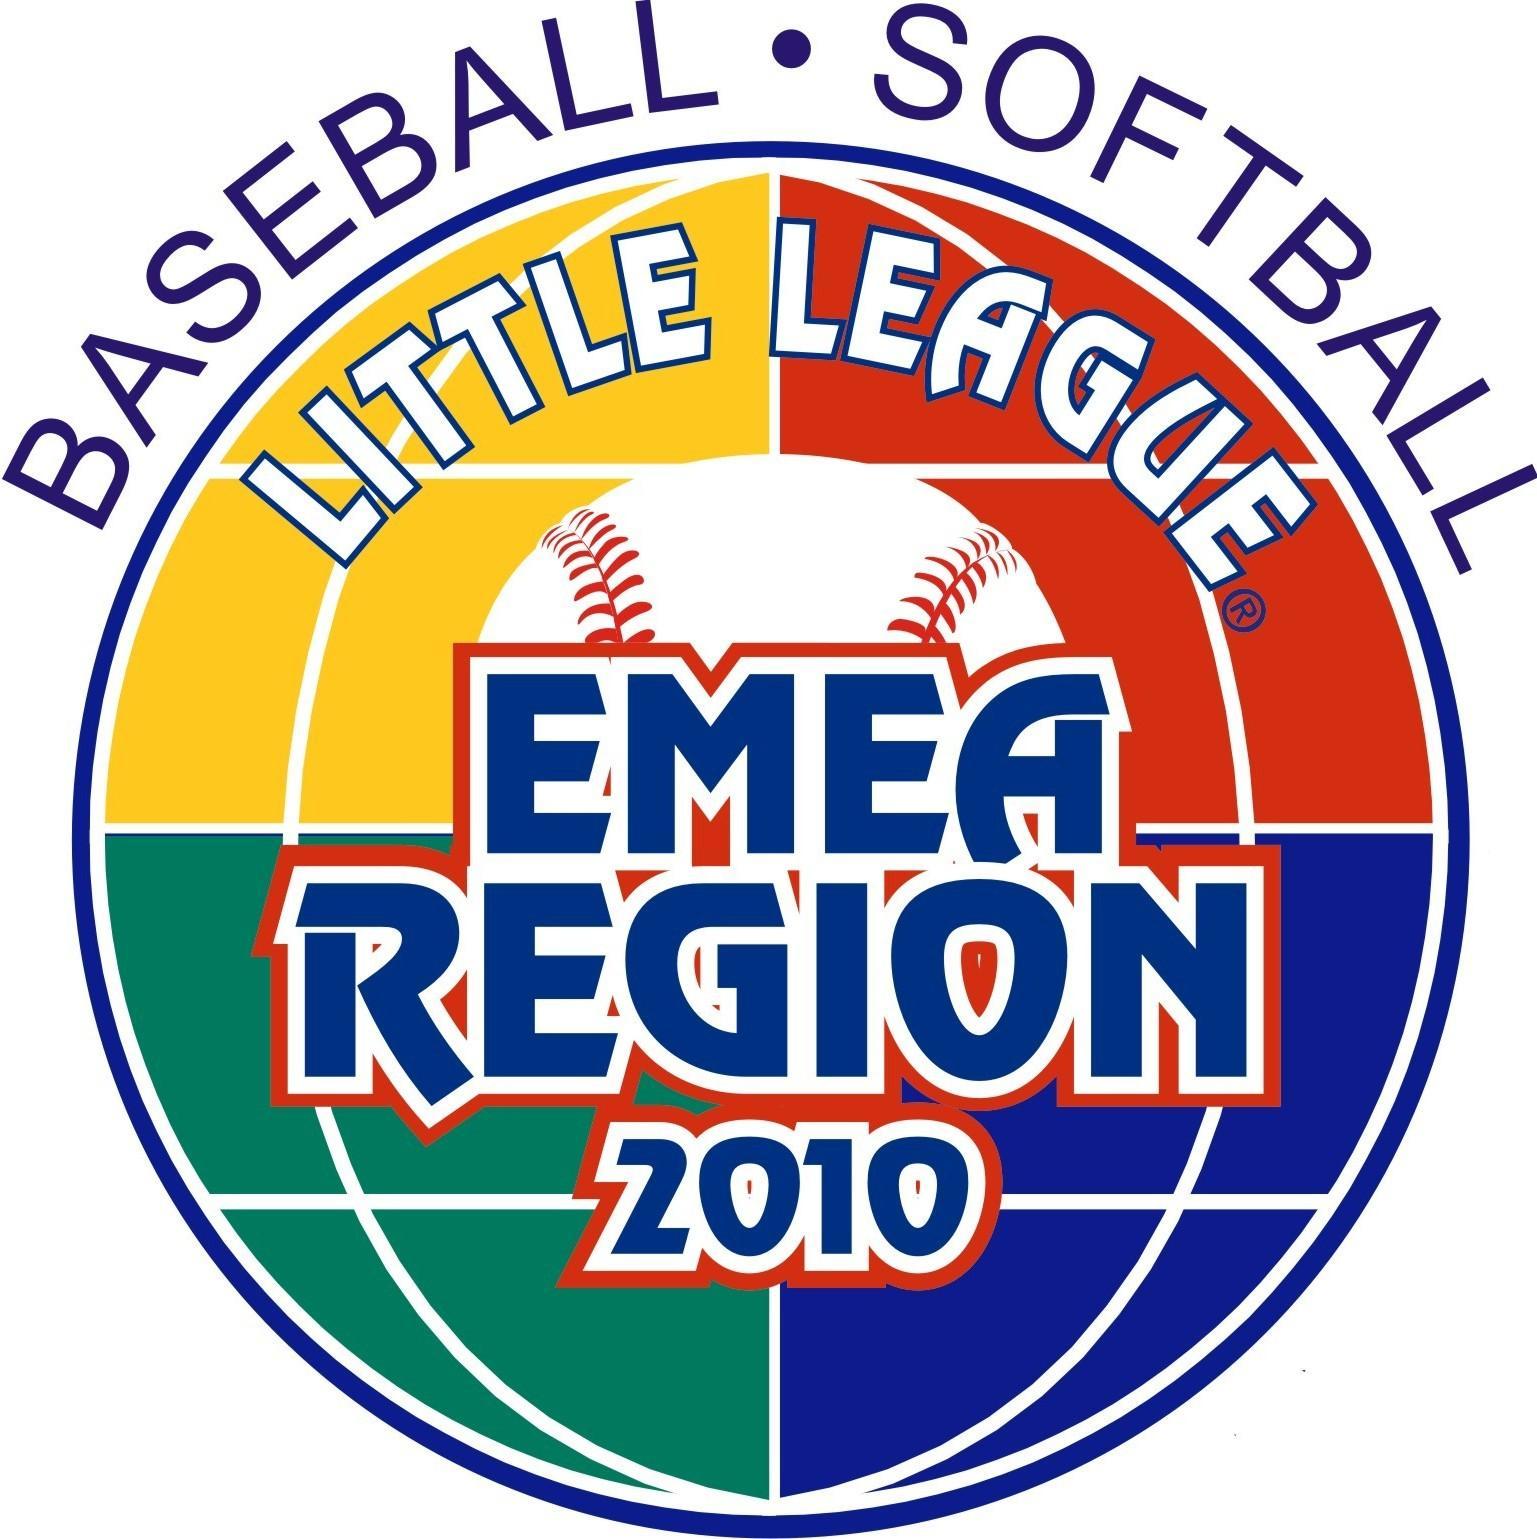 2010 Regional Logo